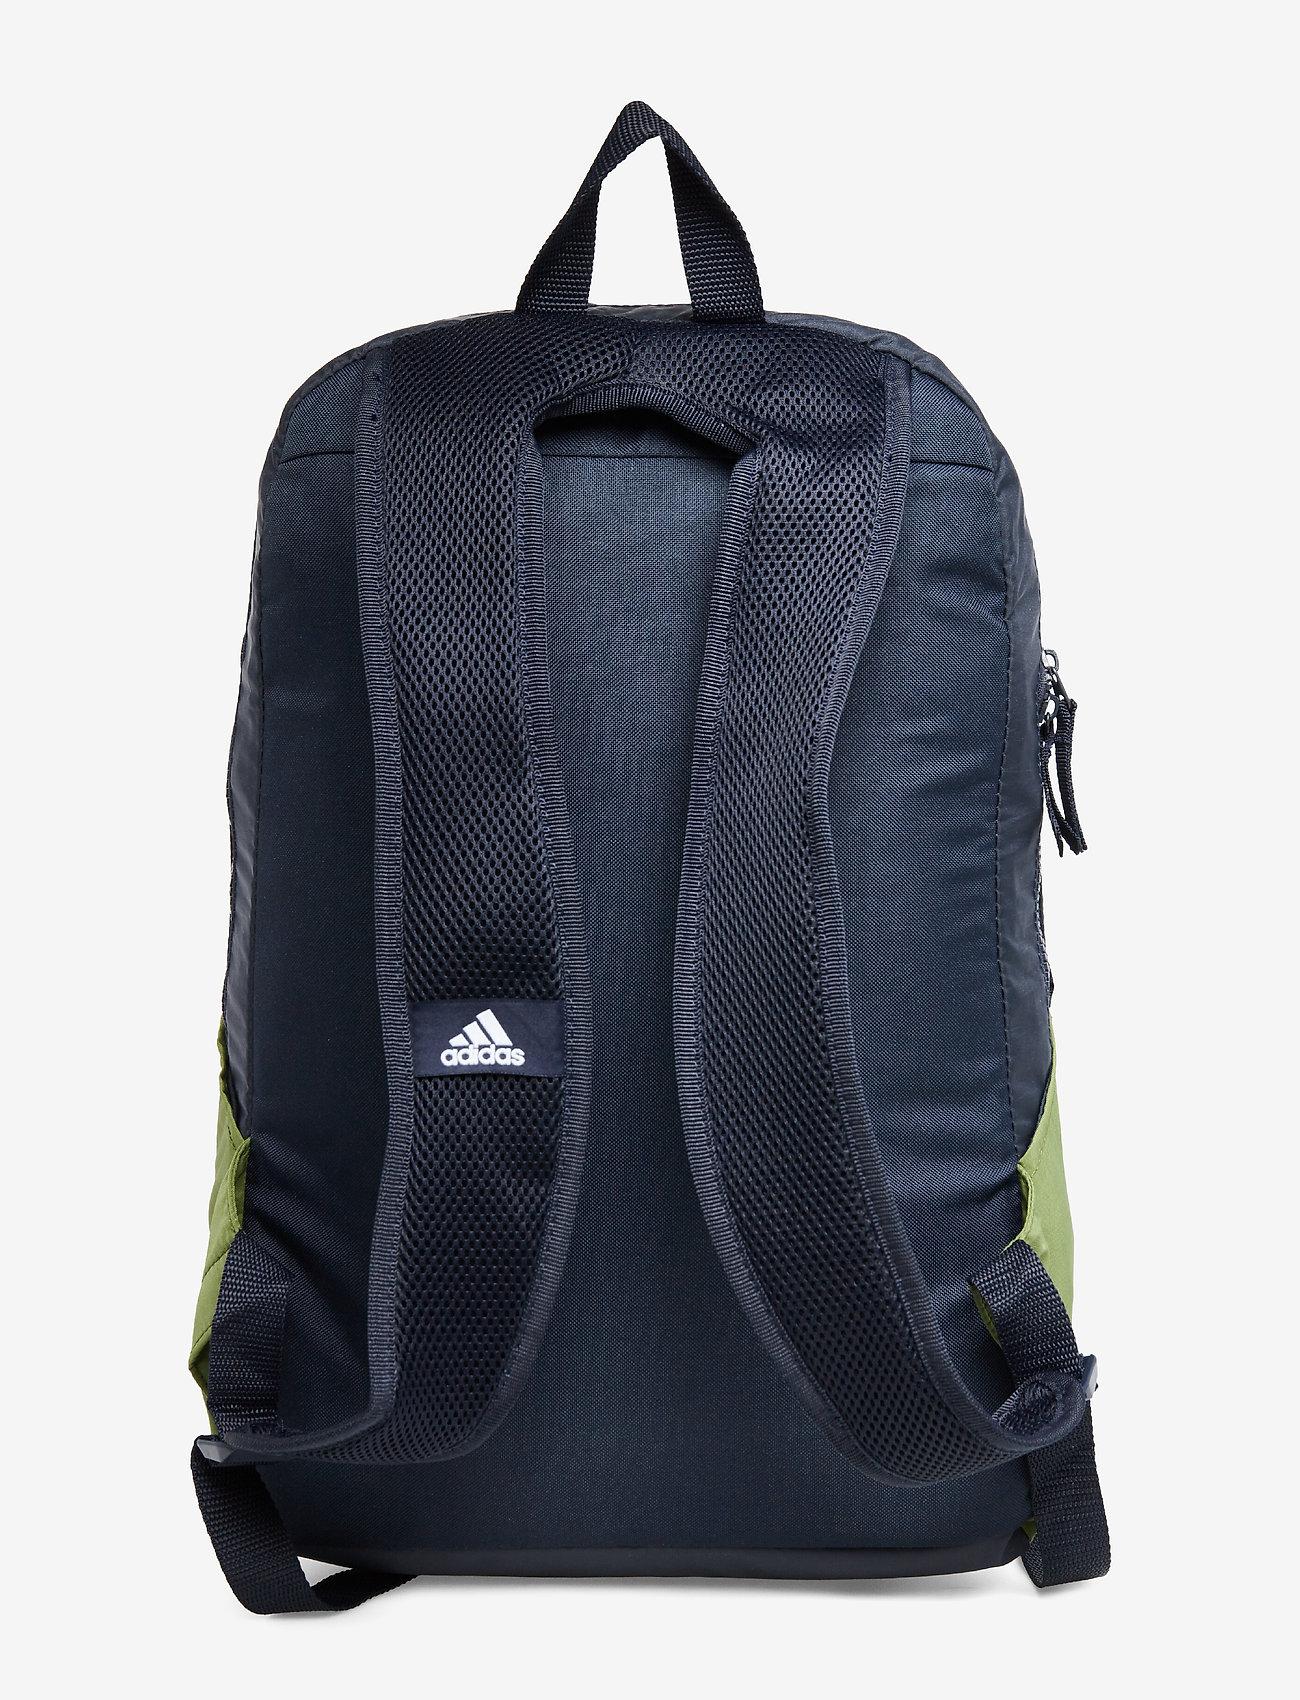 Adidas Performance Parkhood Wnd - Bags